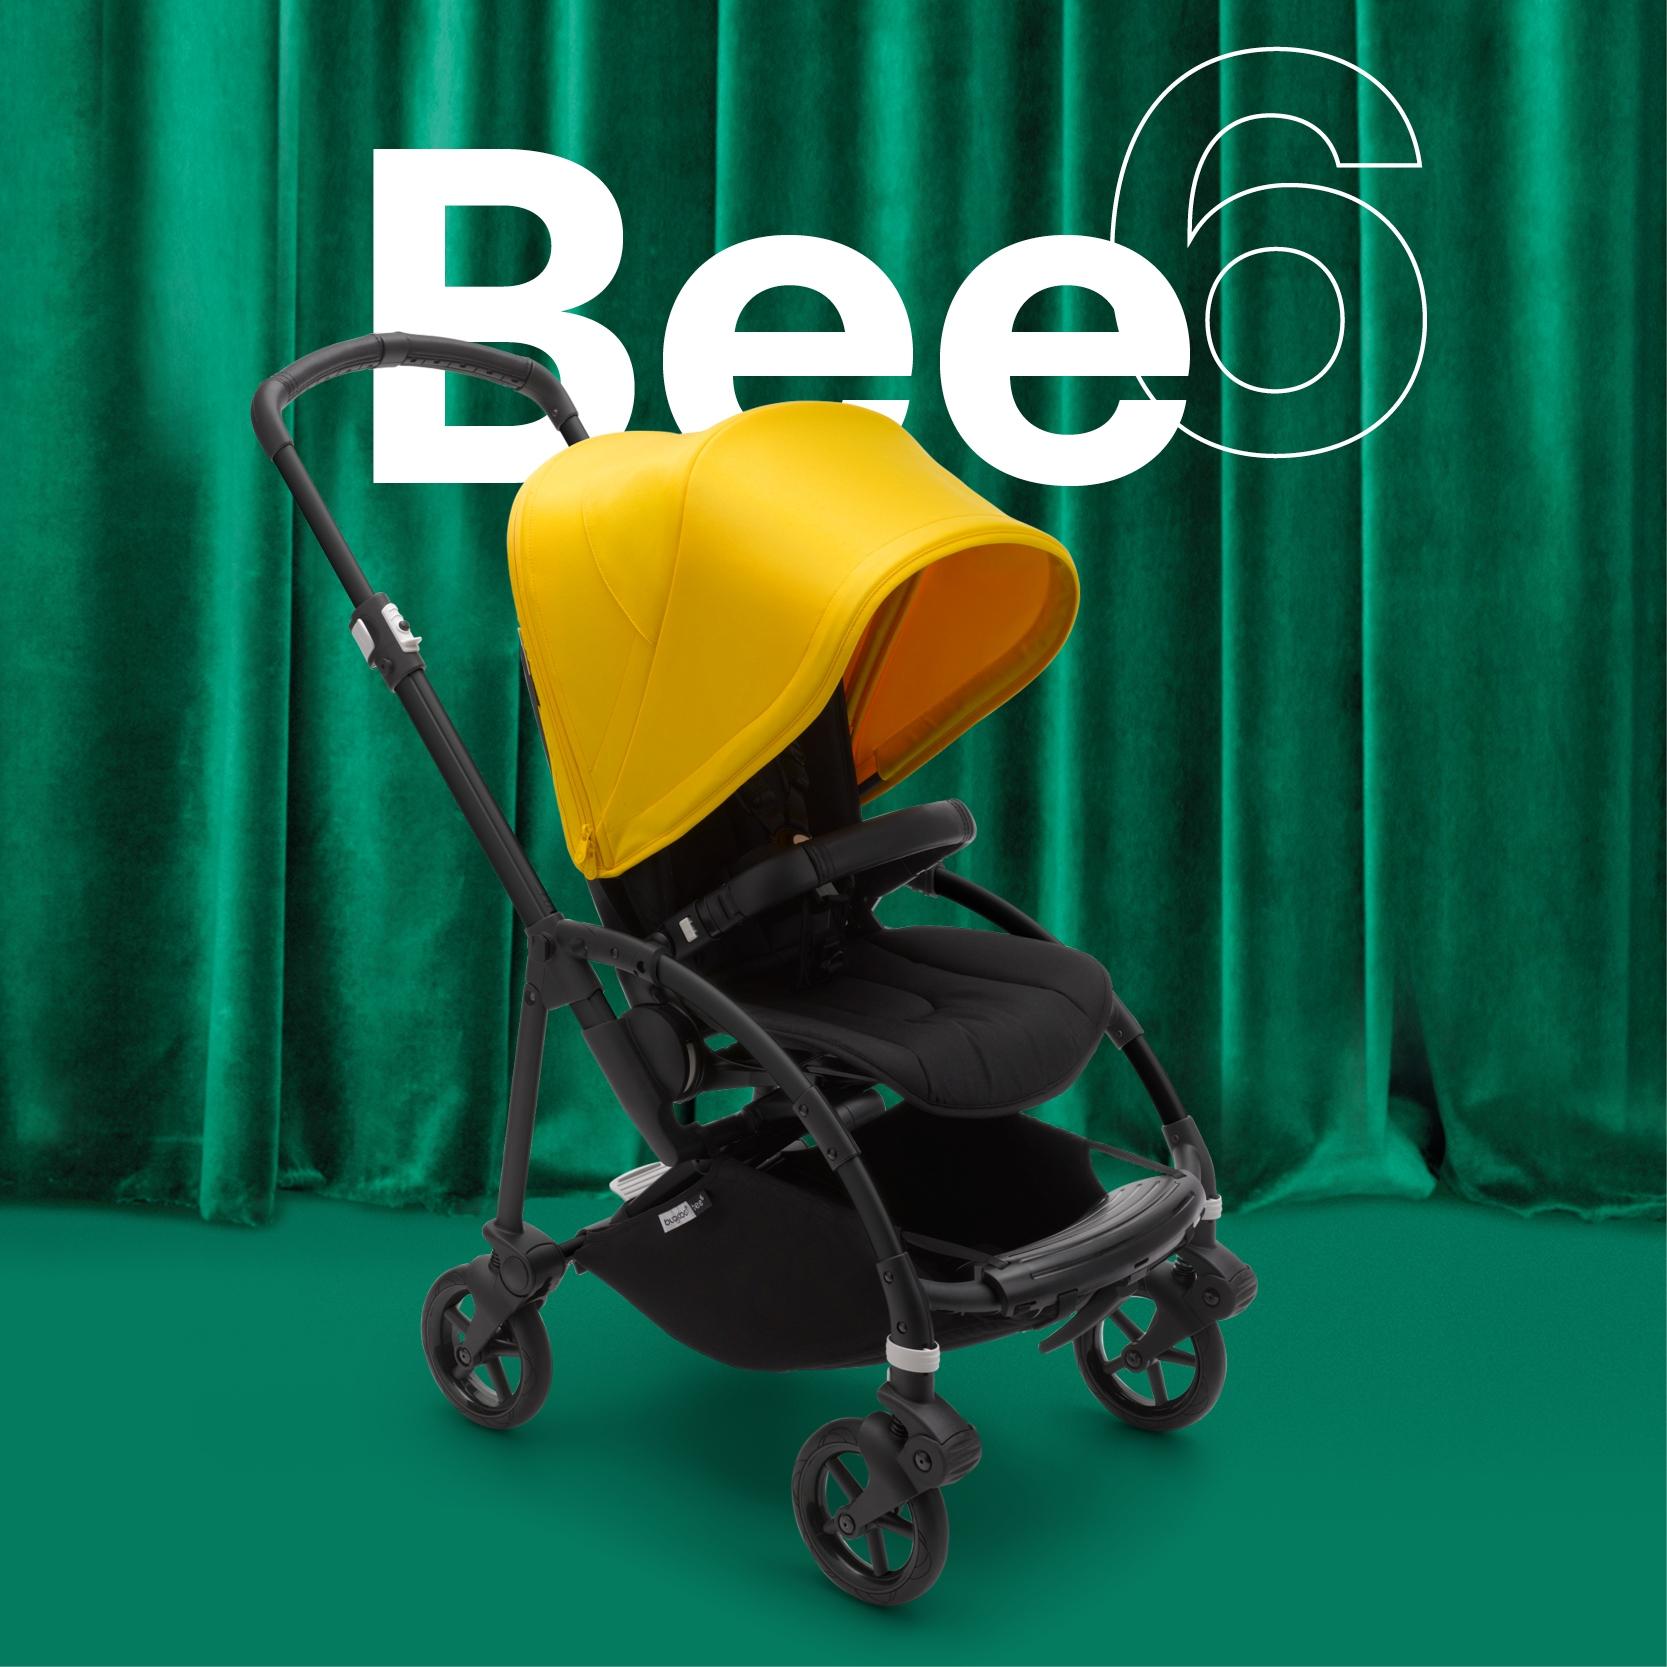 Bugaboo Bee 6 Pushchair